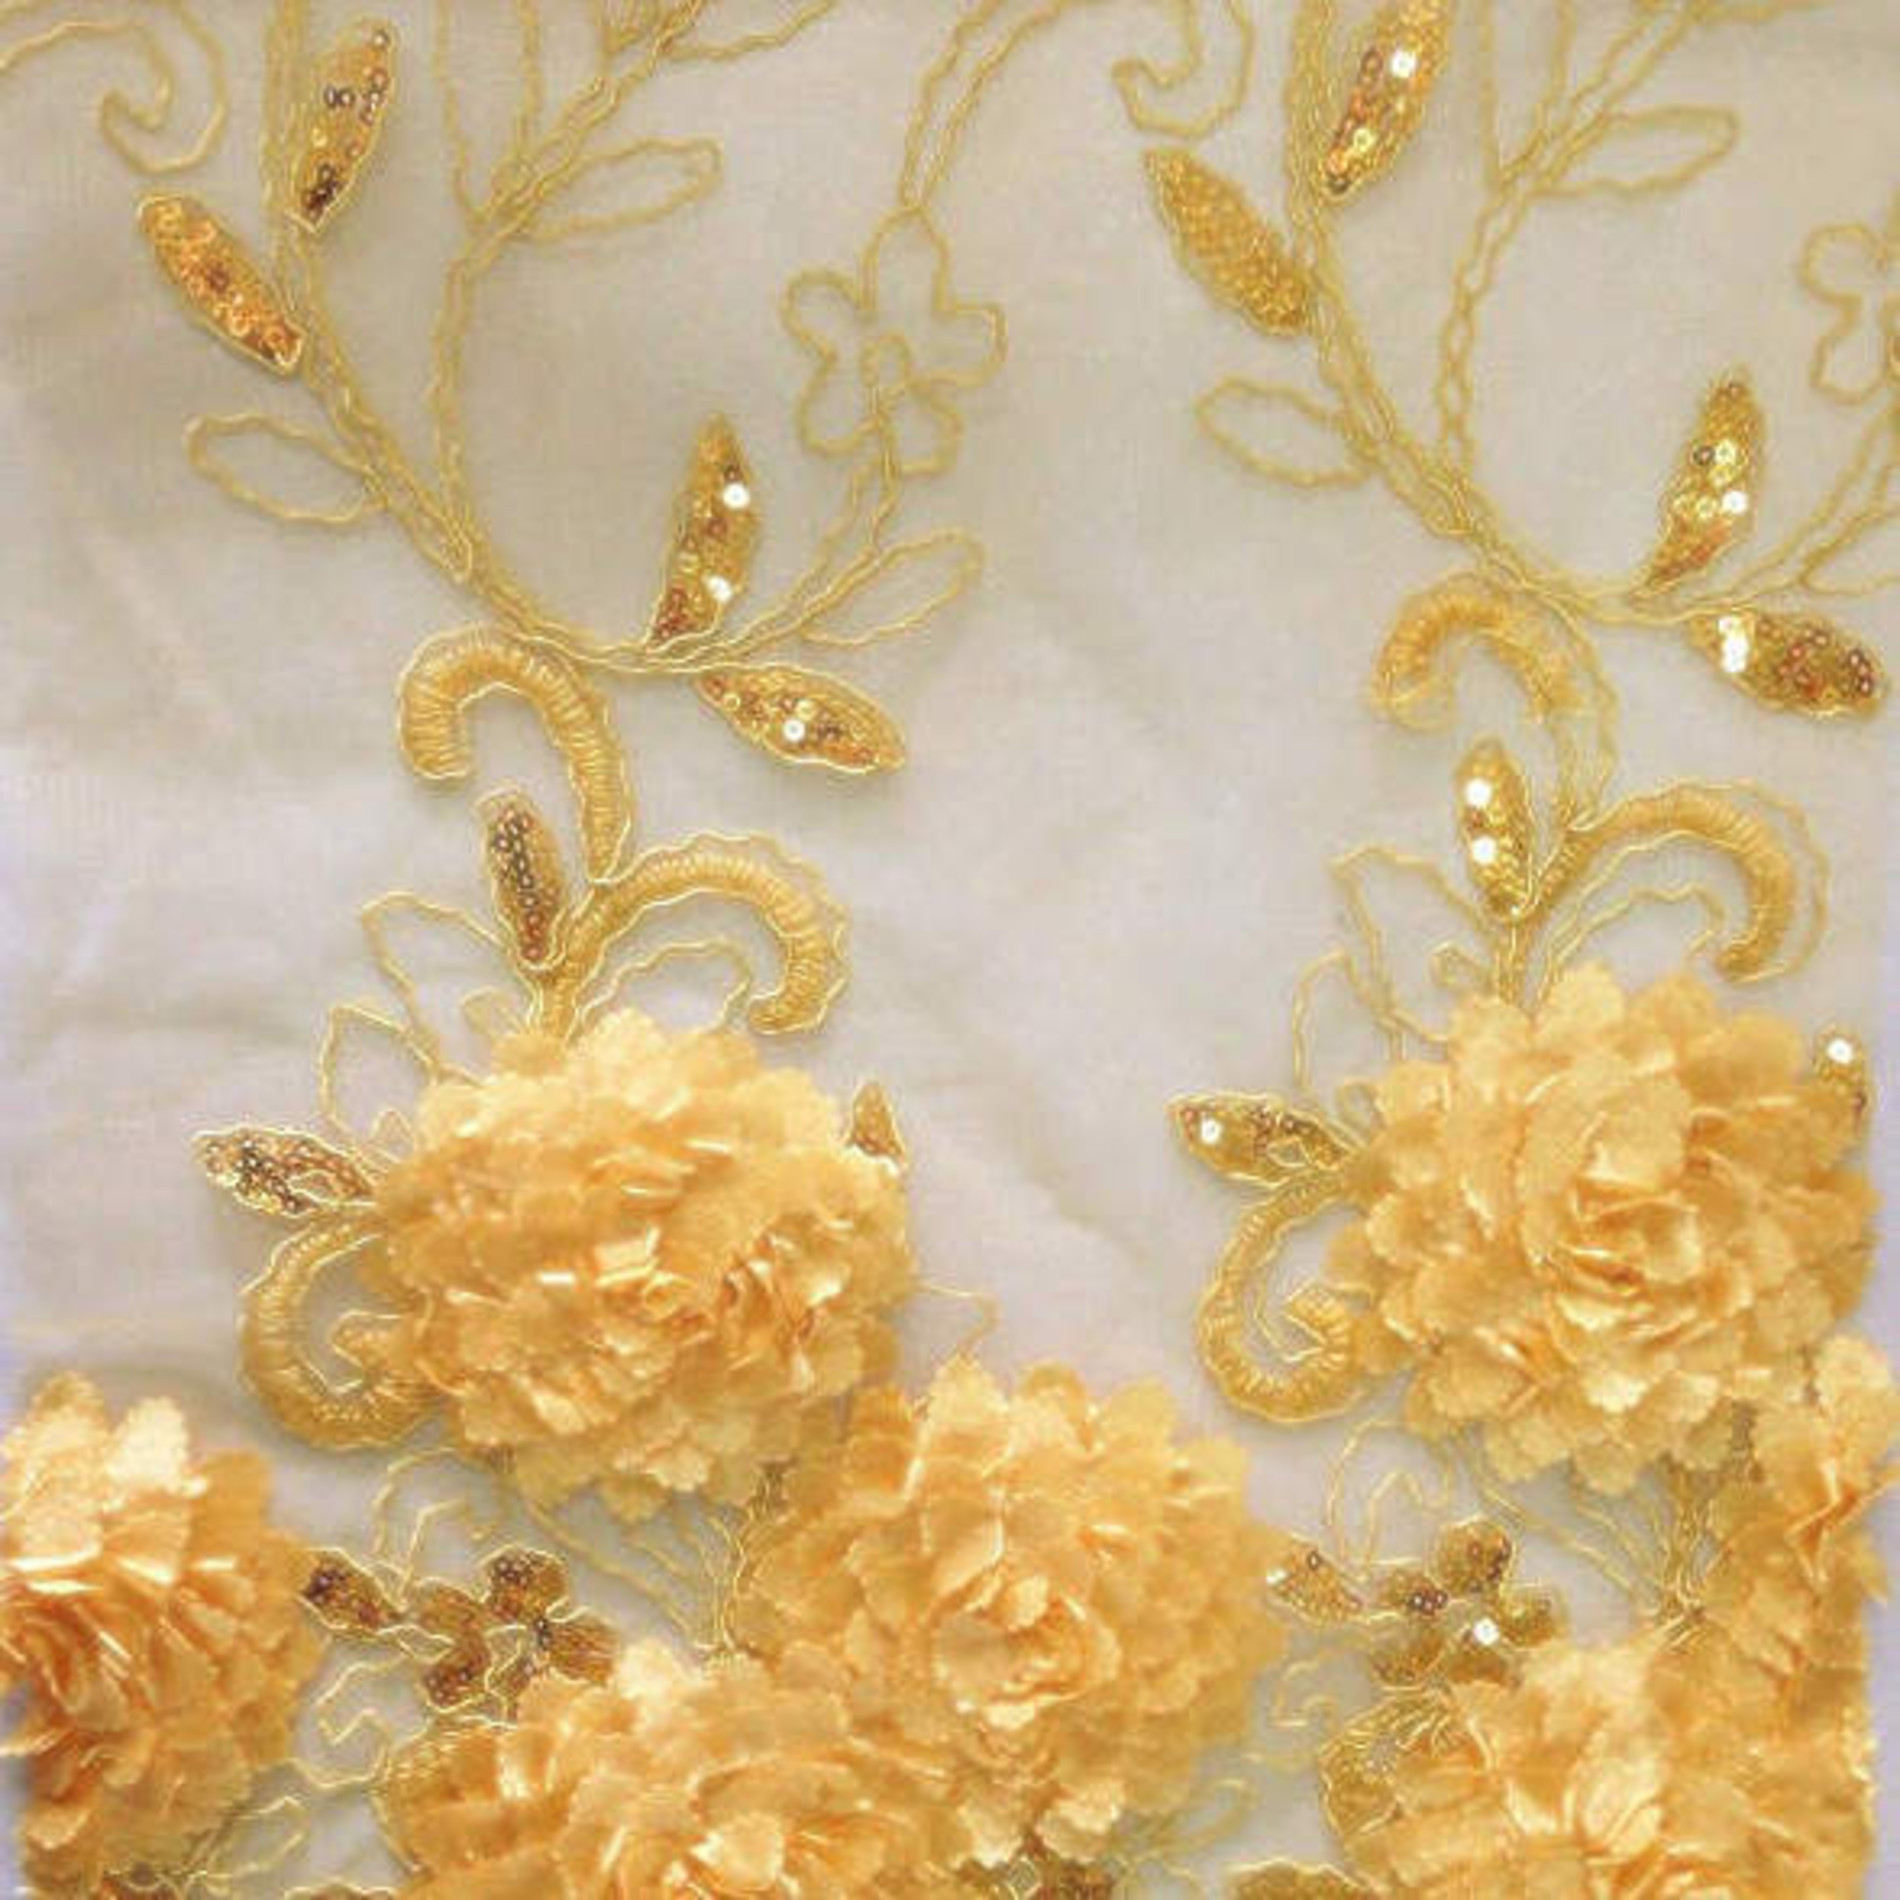 blumen bord ren spitze in gold gelb bestickte spitzen. Black Bedroom Furniture Sets. Home Design Ideas